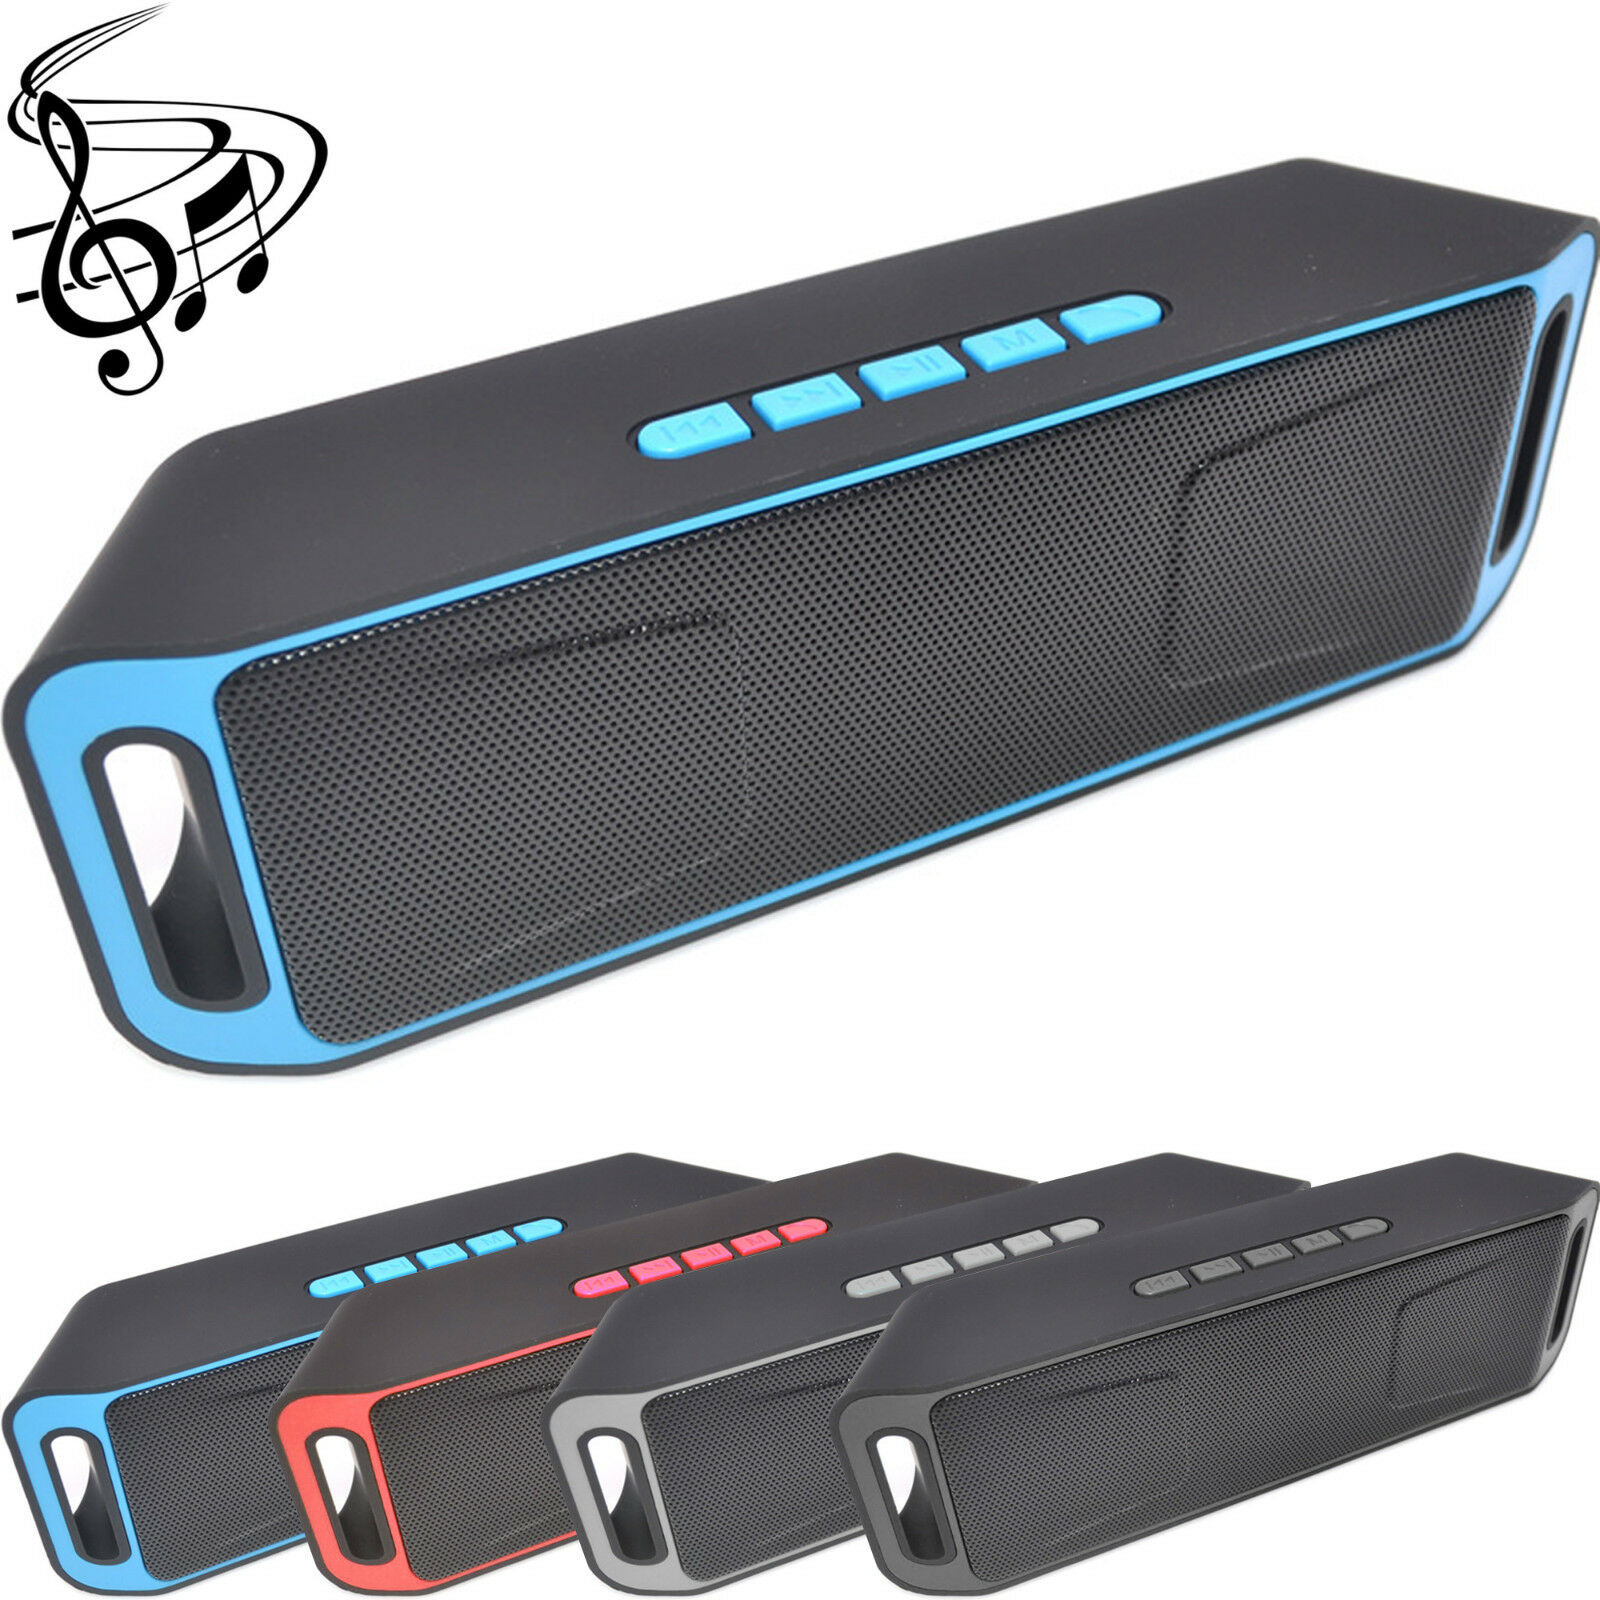 Portable Wireless Bluetooth Speaker Waterproof Bass USB/TF/AUX MP3 Radio Playe R 2